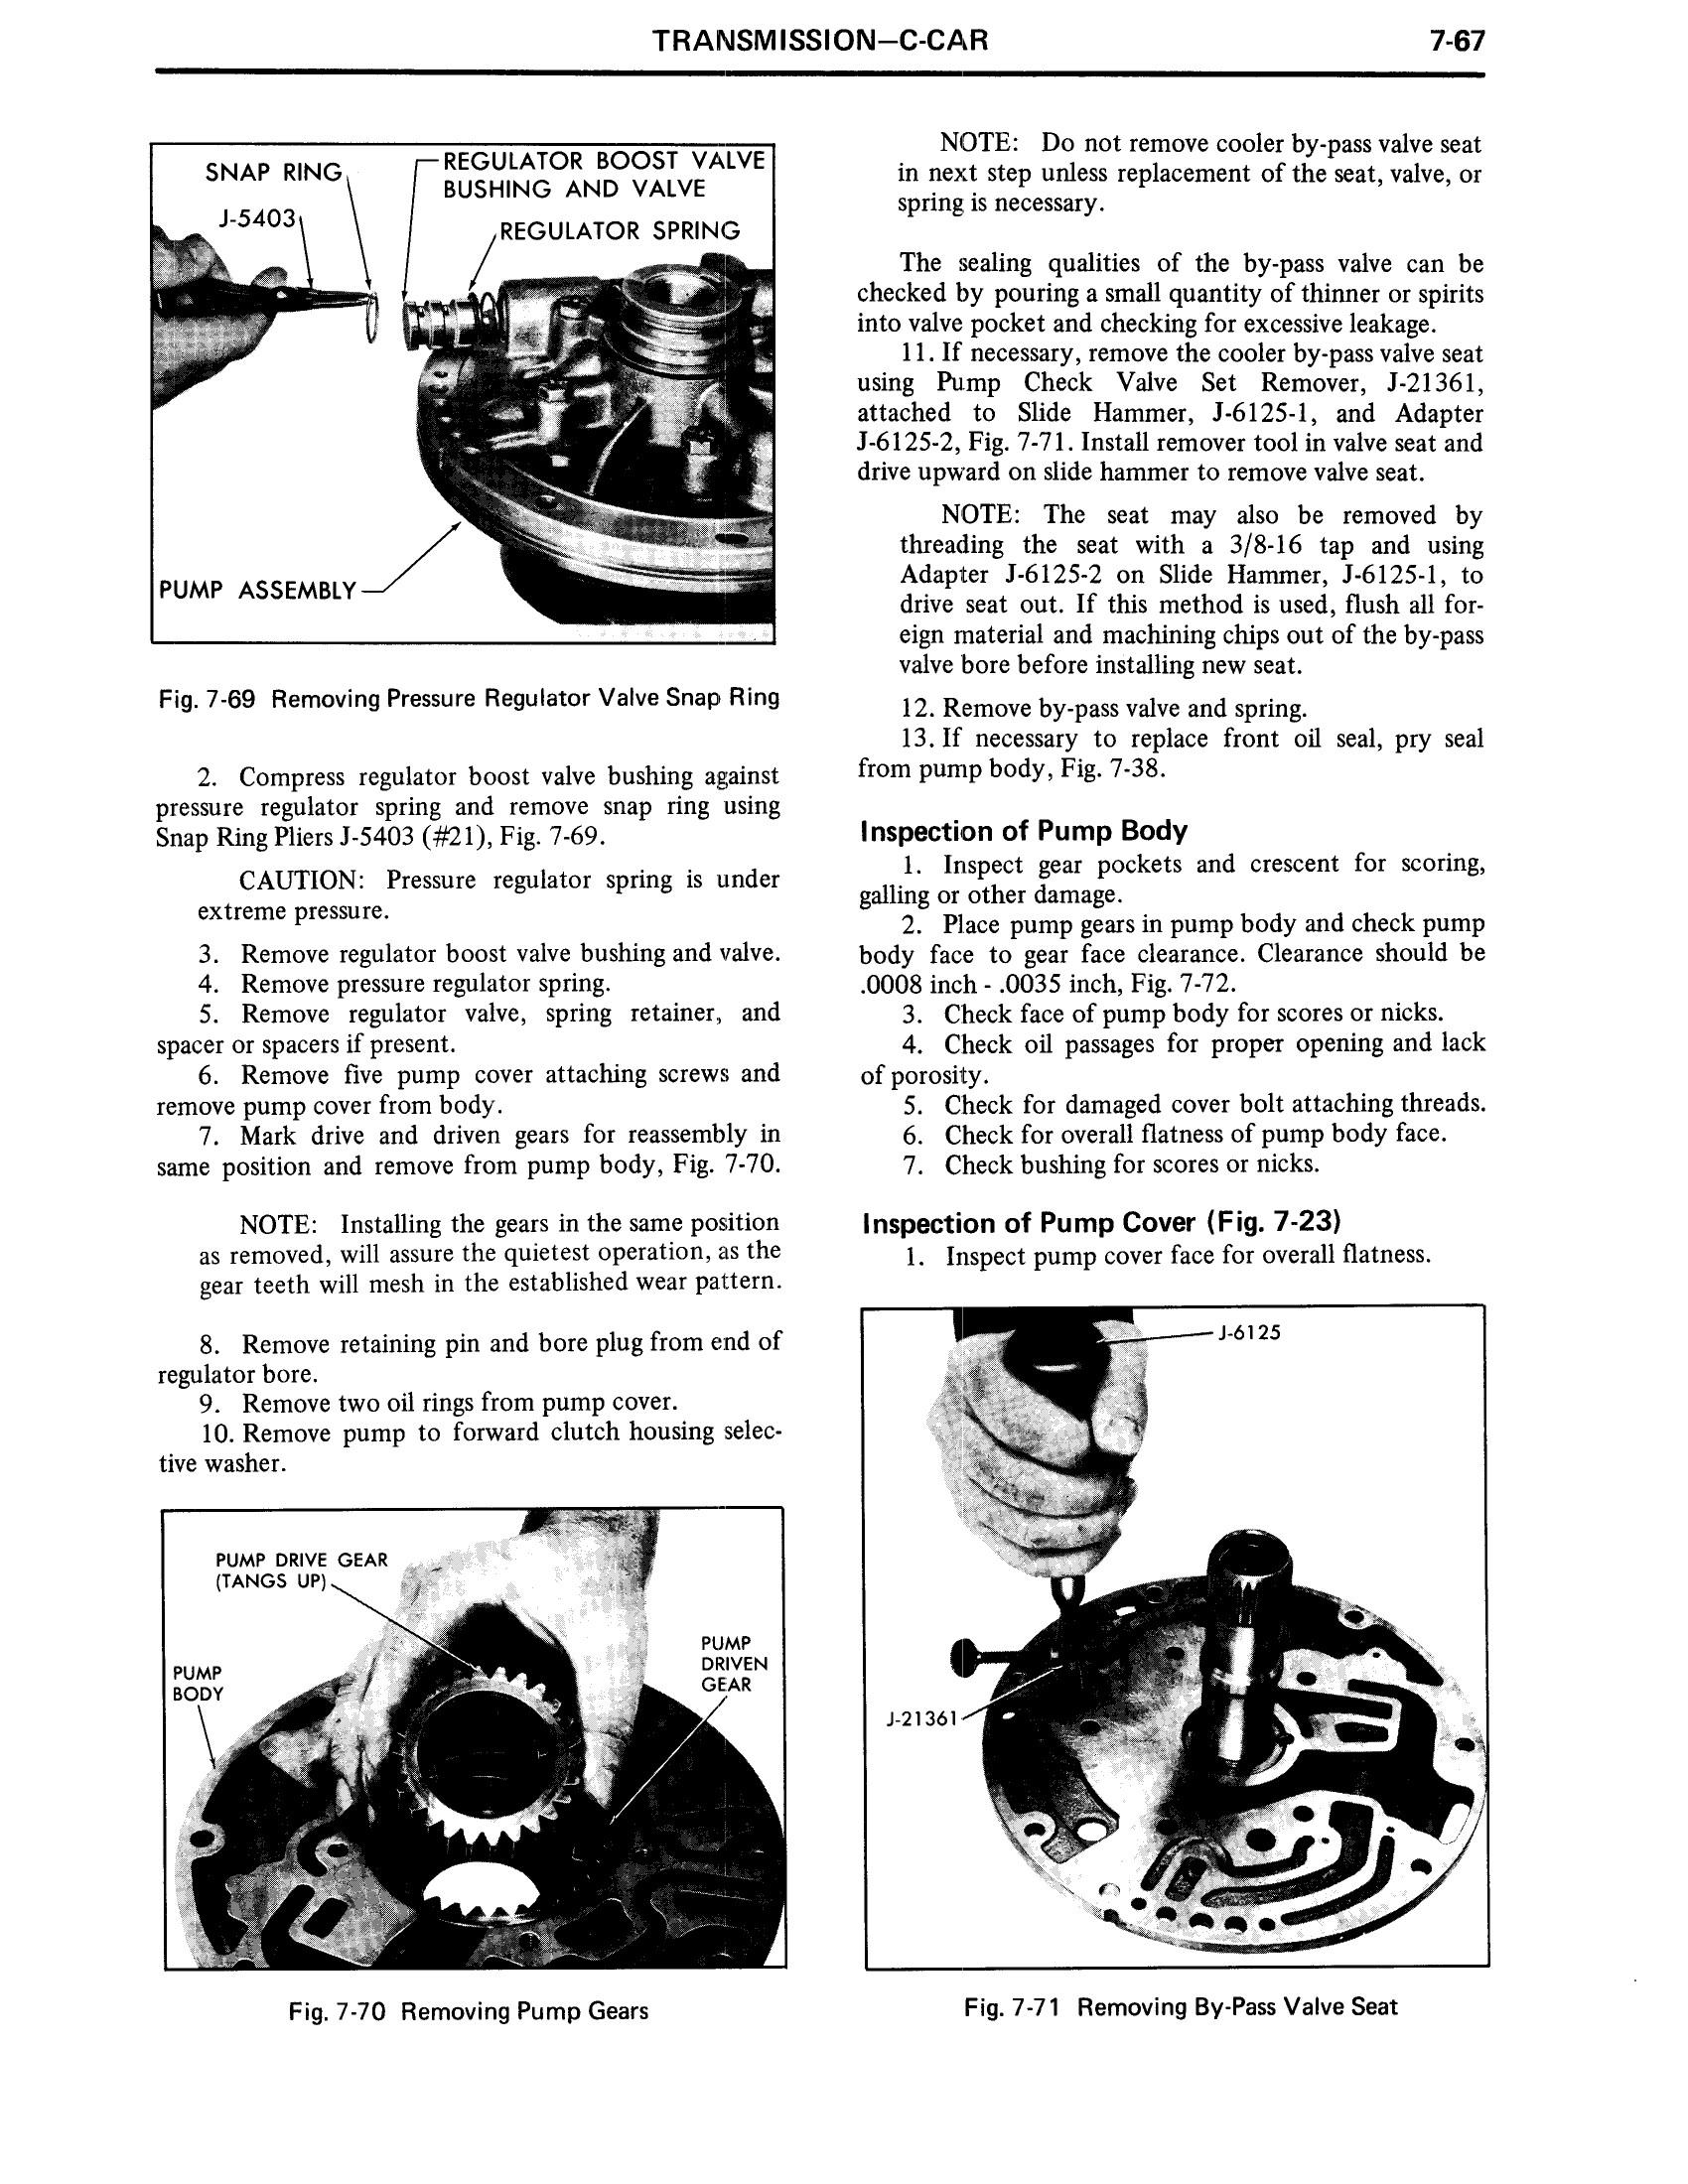 1971 Cadillac Shop Manual- Transmission Page 67 of 156